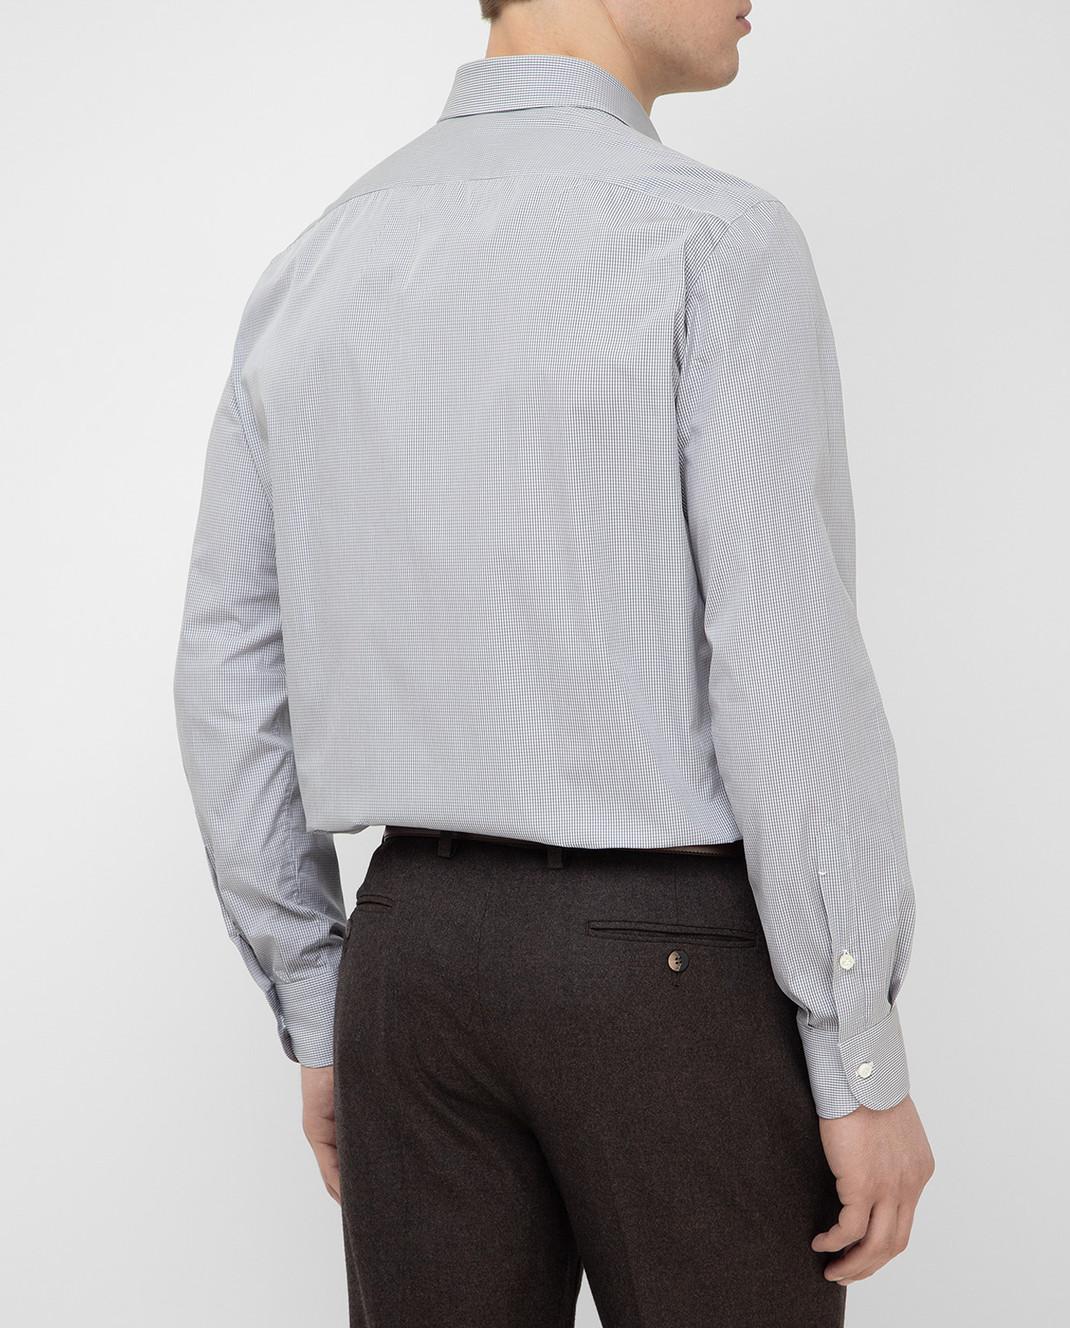 Luciano Lombardi Серая рубашка 990631 изображение 4